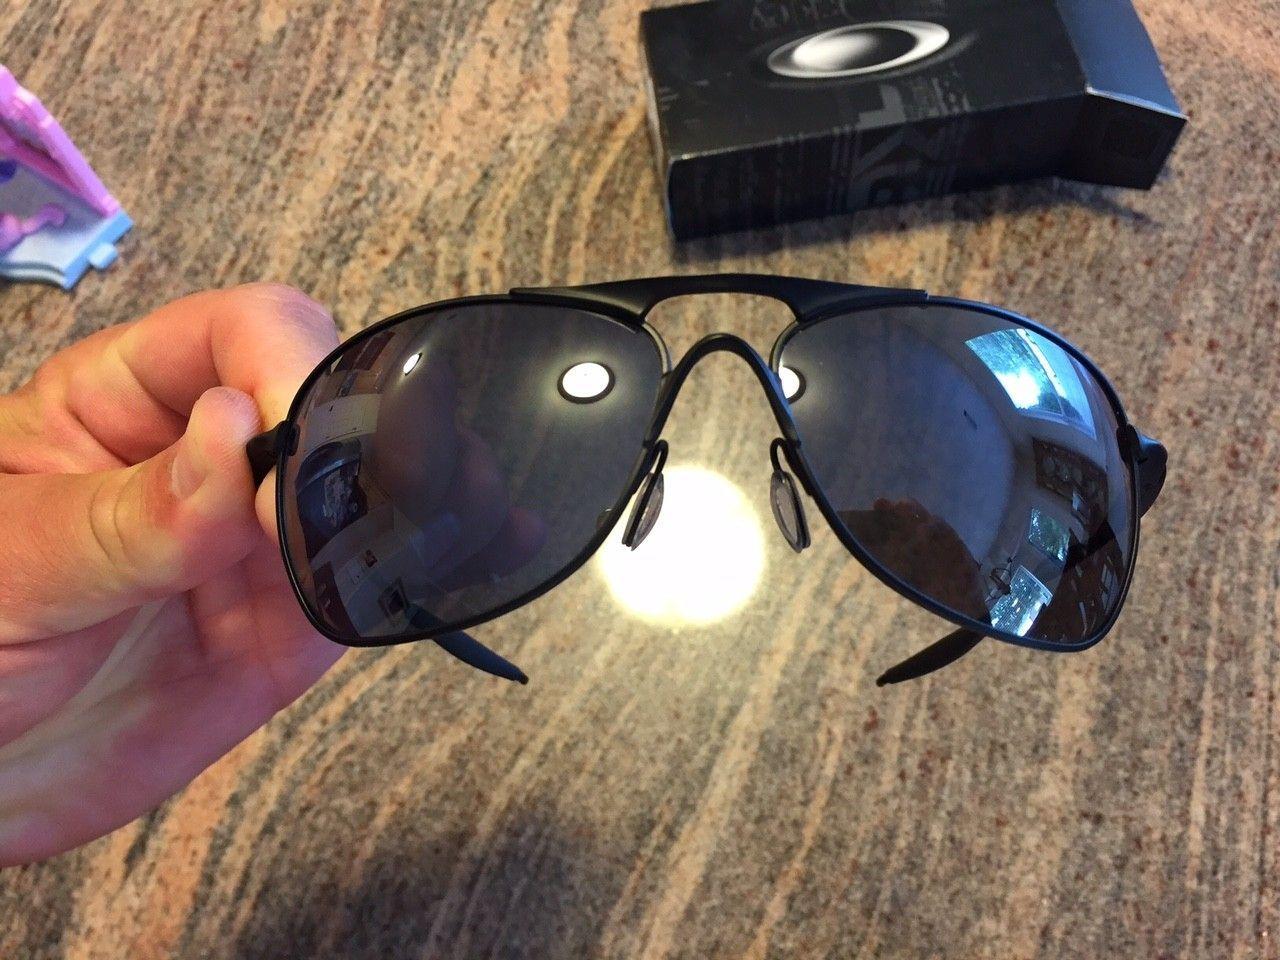 Crosshair - Matte Black/Black Iridium Sunglasses - IMG_5857.JPG